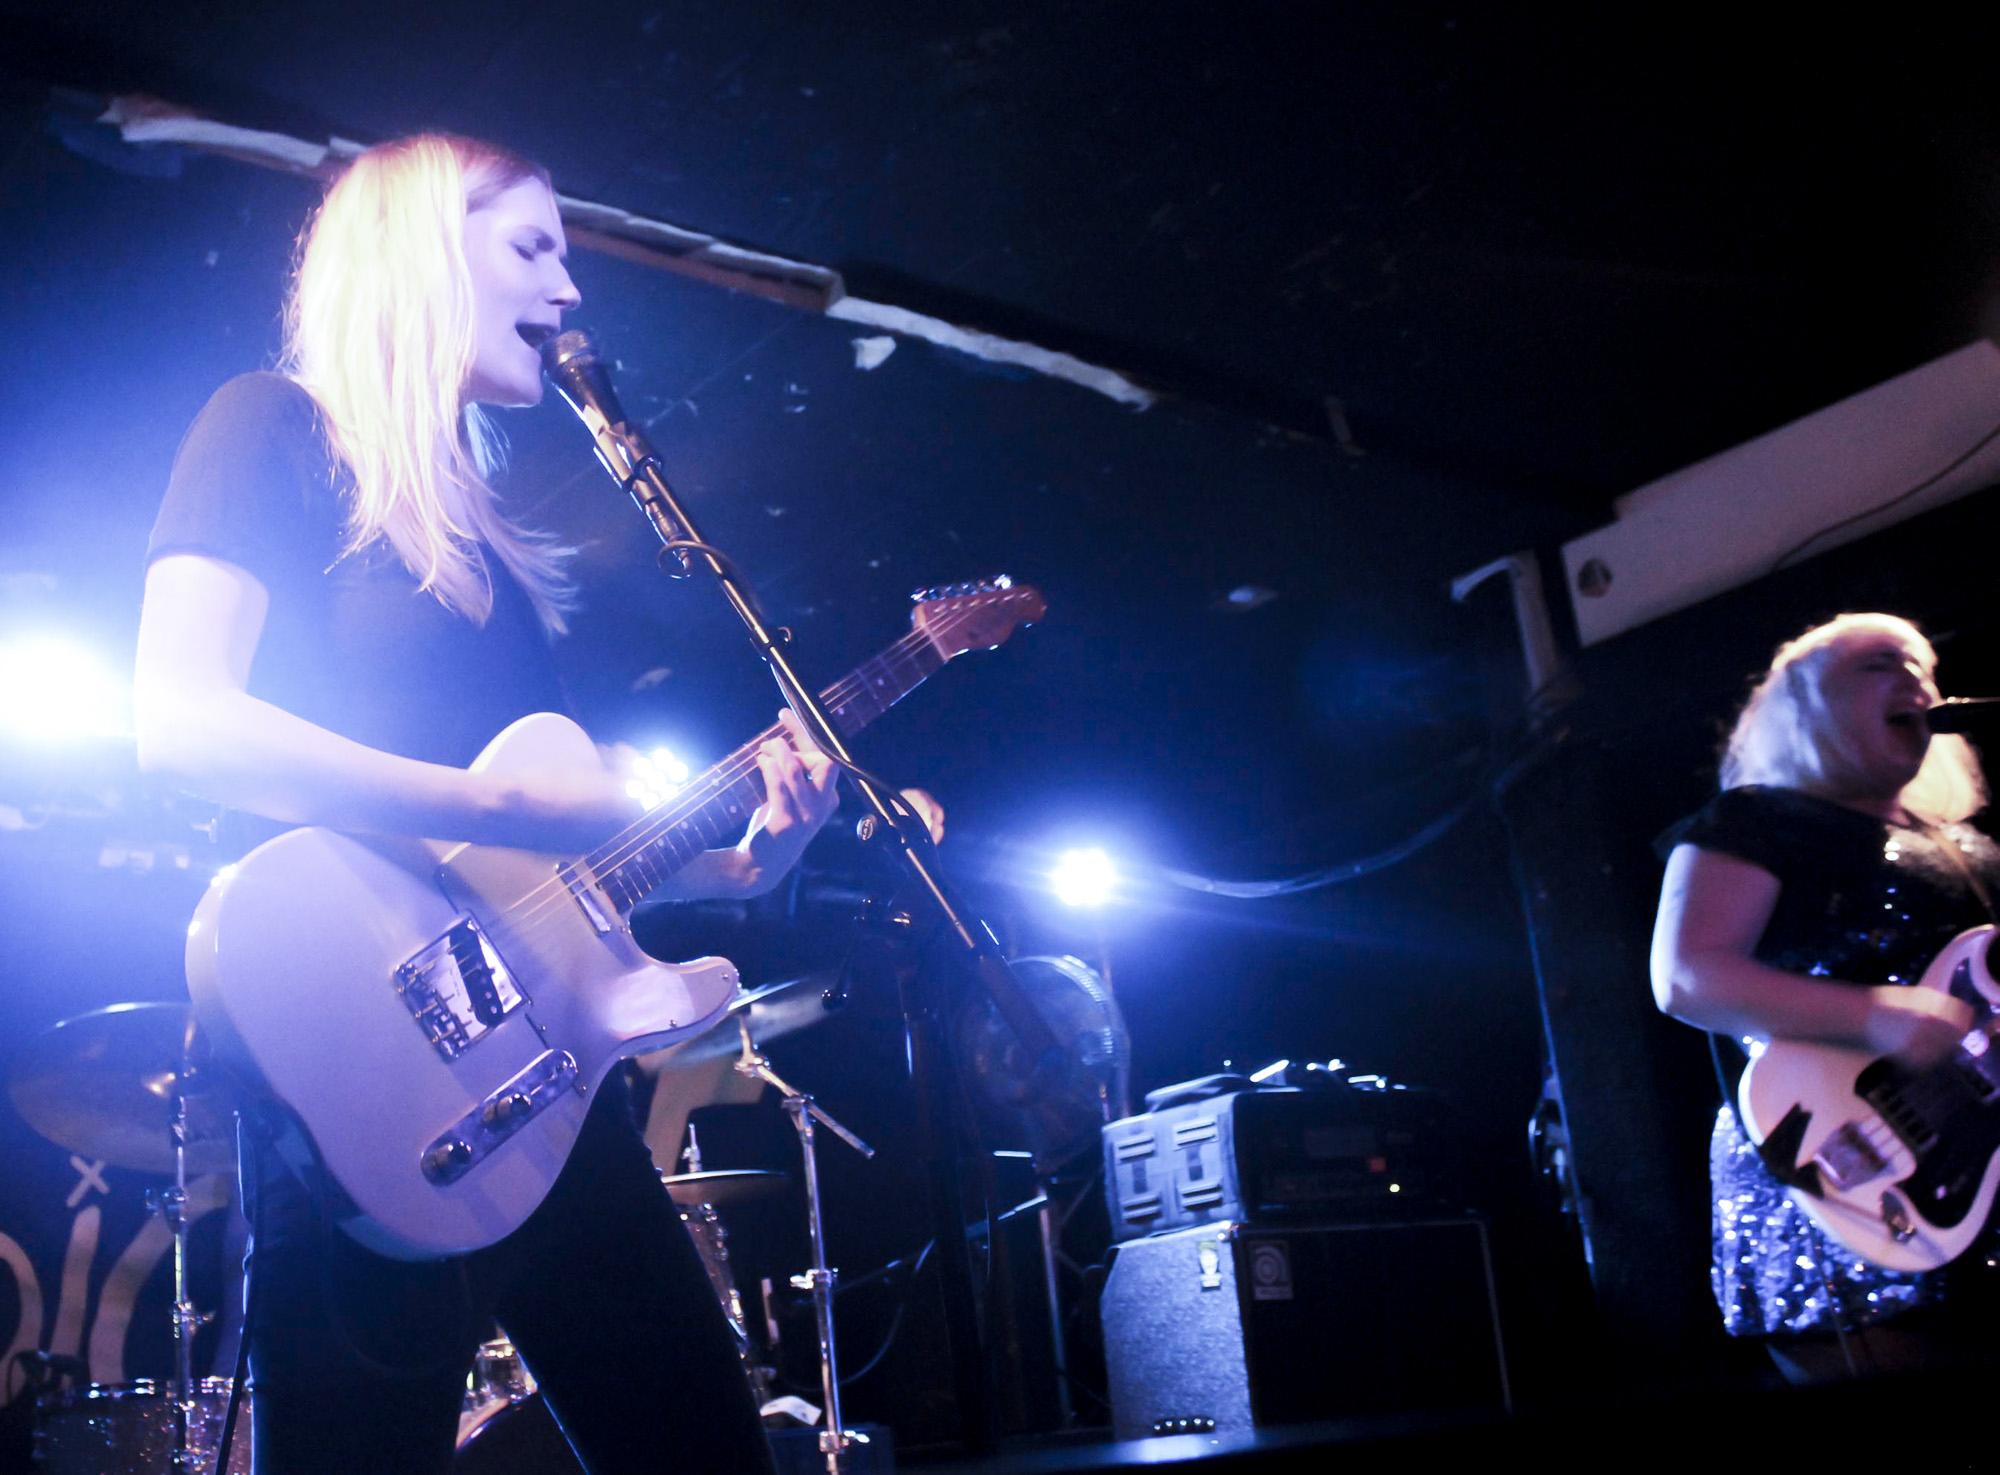 Livefoto. Band i bild: Lava Bangs. Foto av Edward Forslund